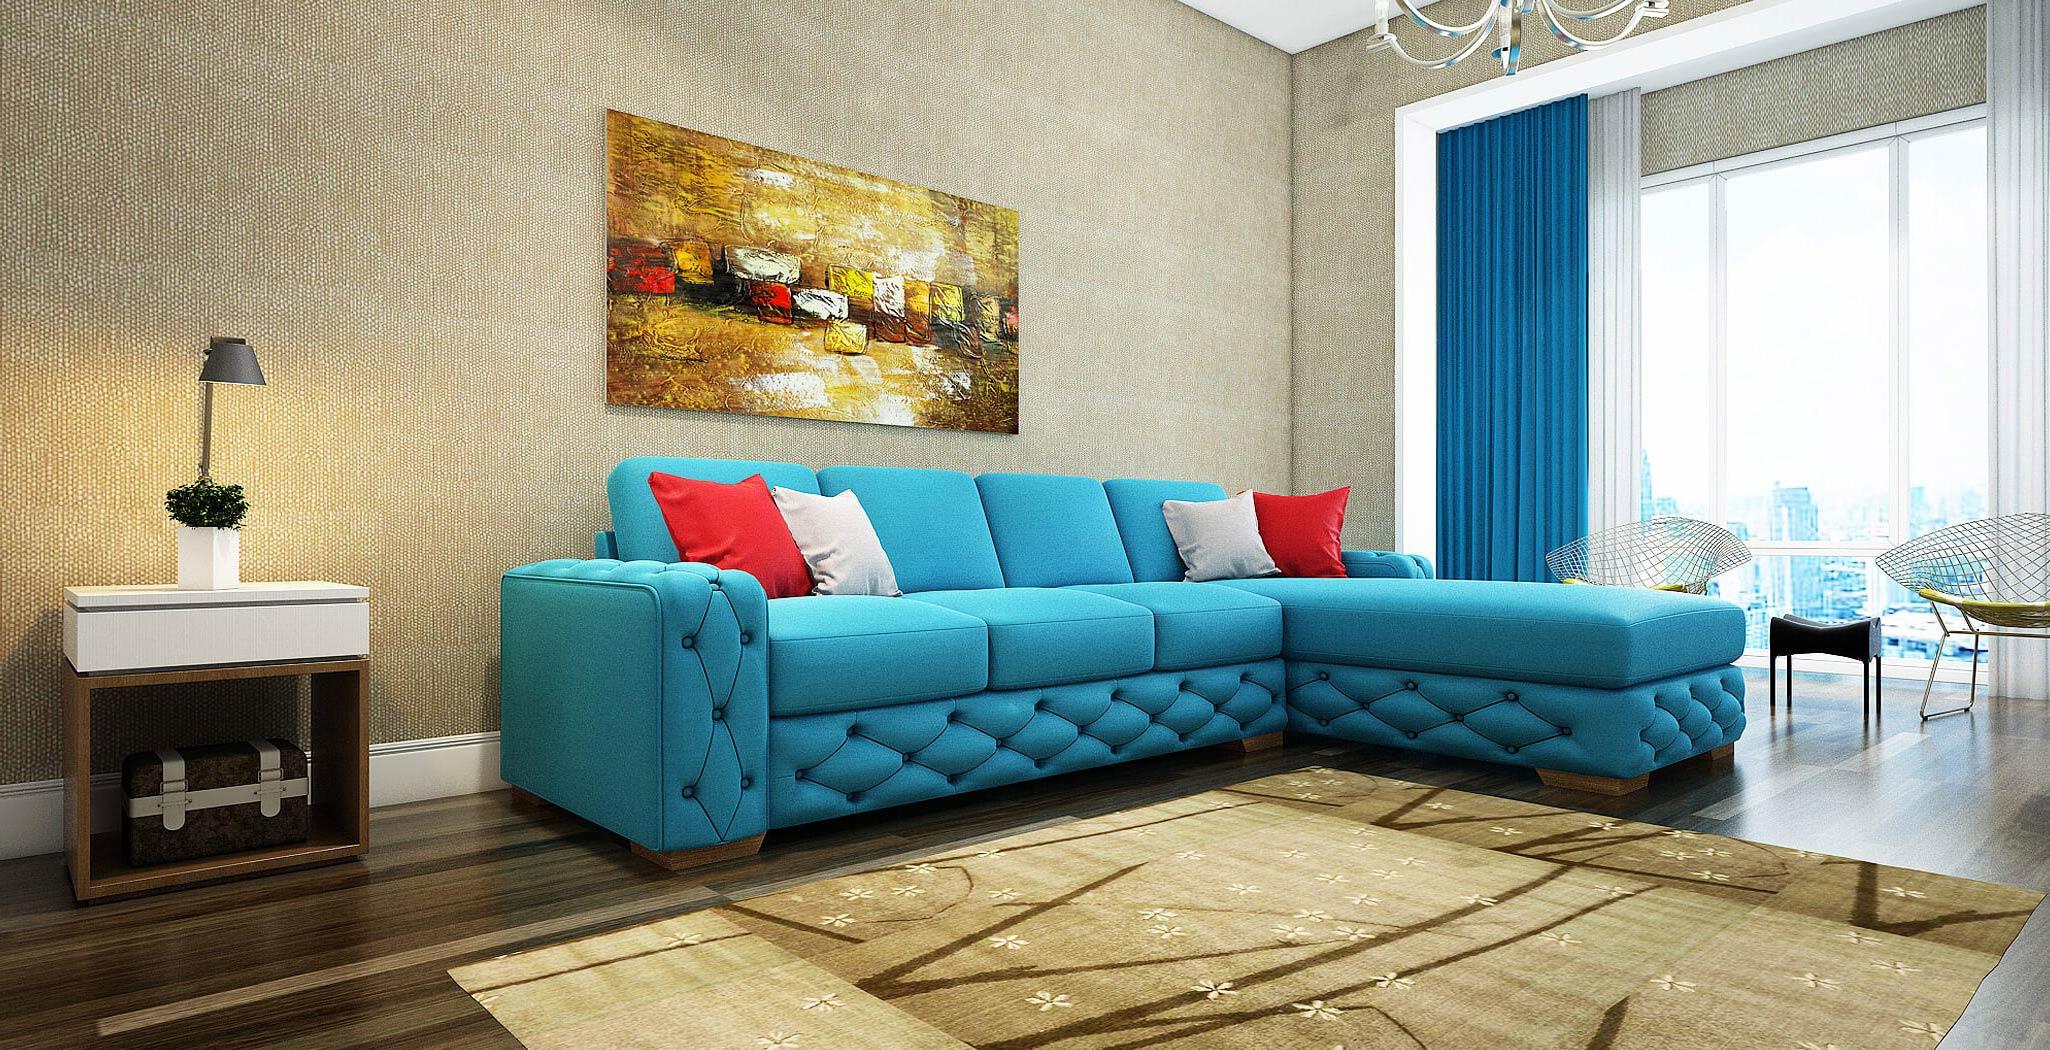 windsor panel furniture gallery 5